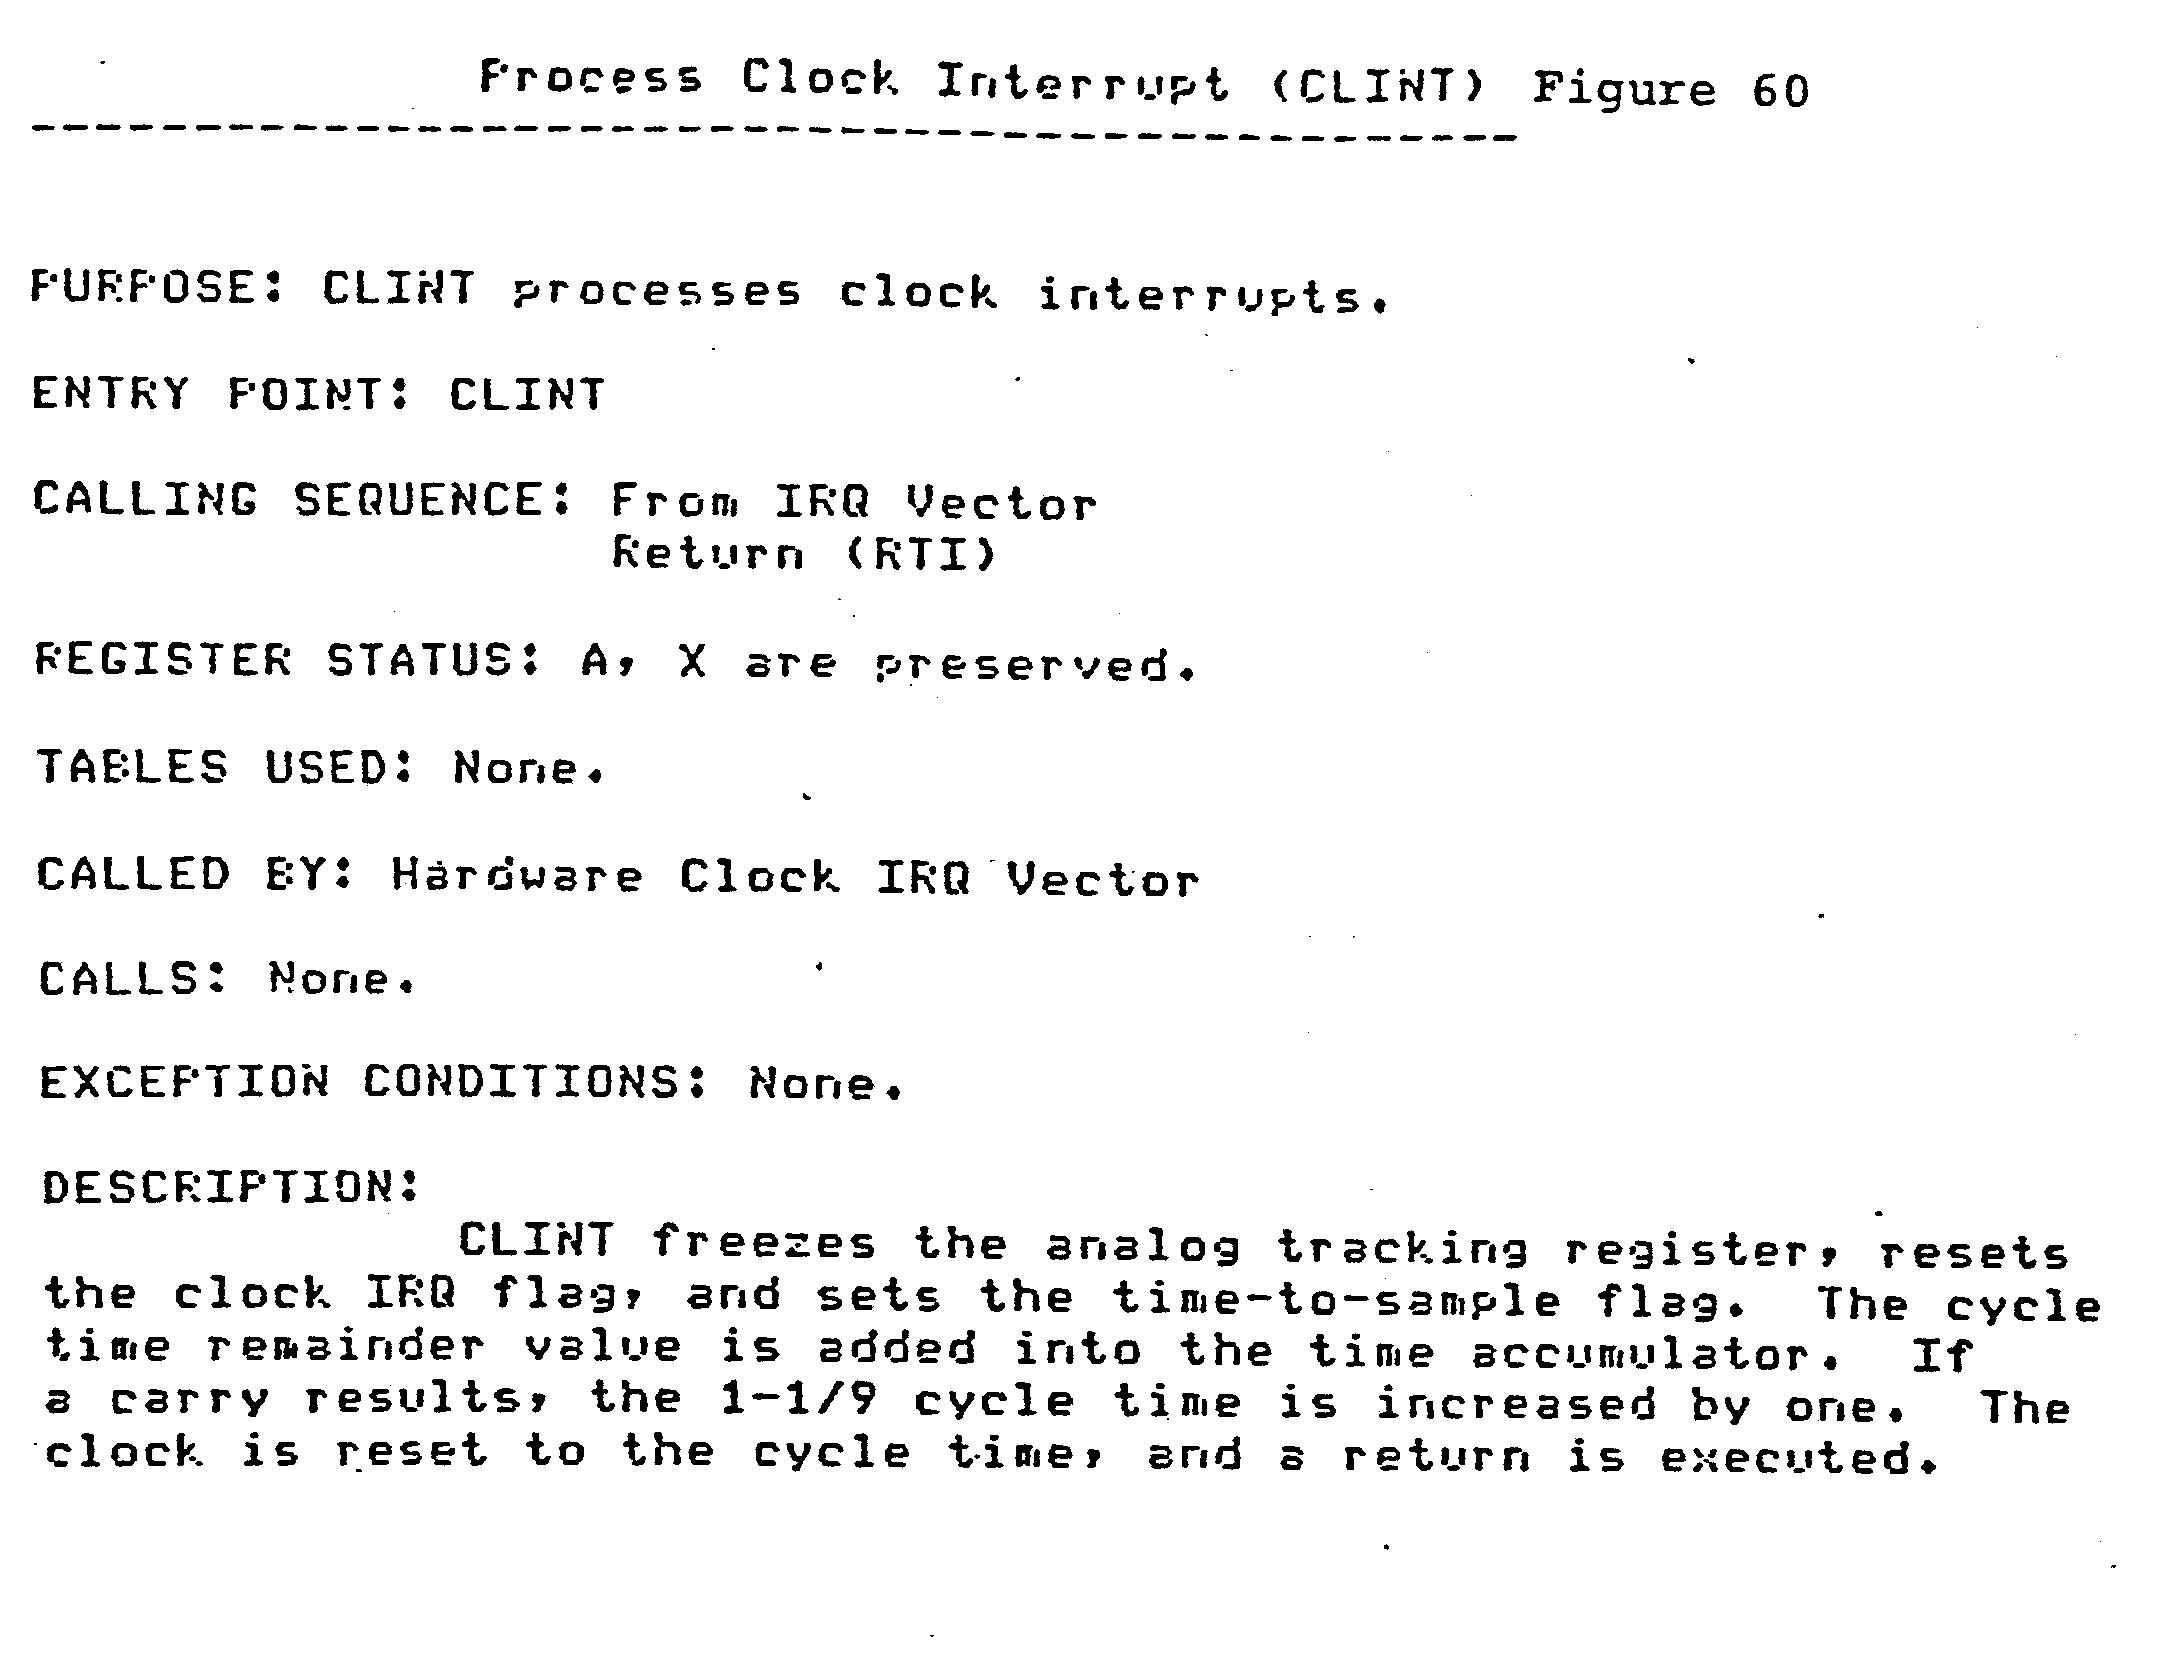 Ep0218225a2 Transmission Line Mounted Sensor Module Google Patents Donut Ct Wiring Diagram Figure Imgb0027